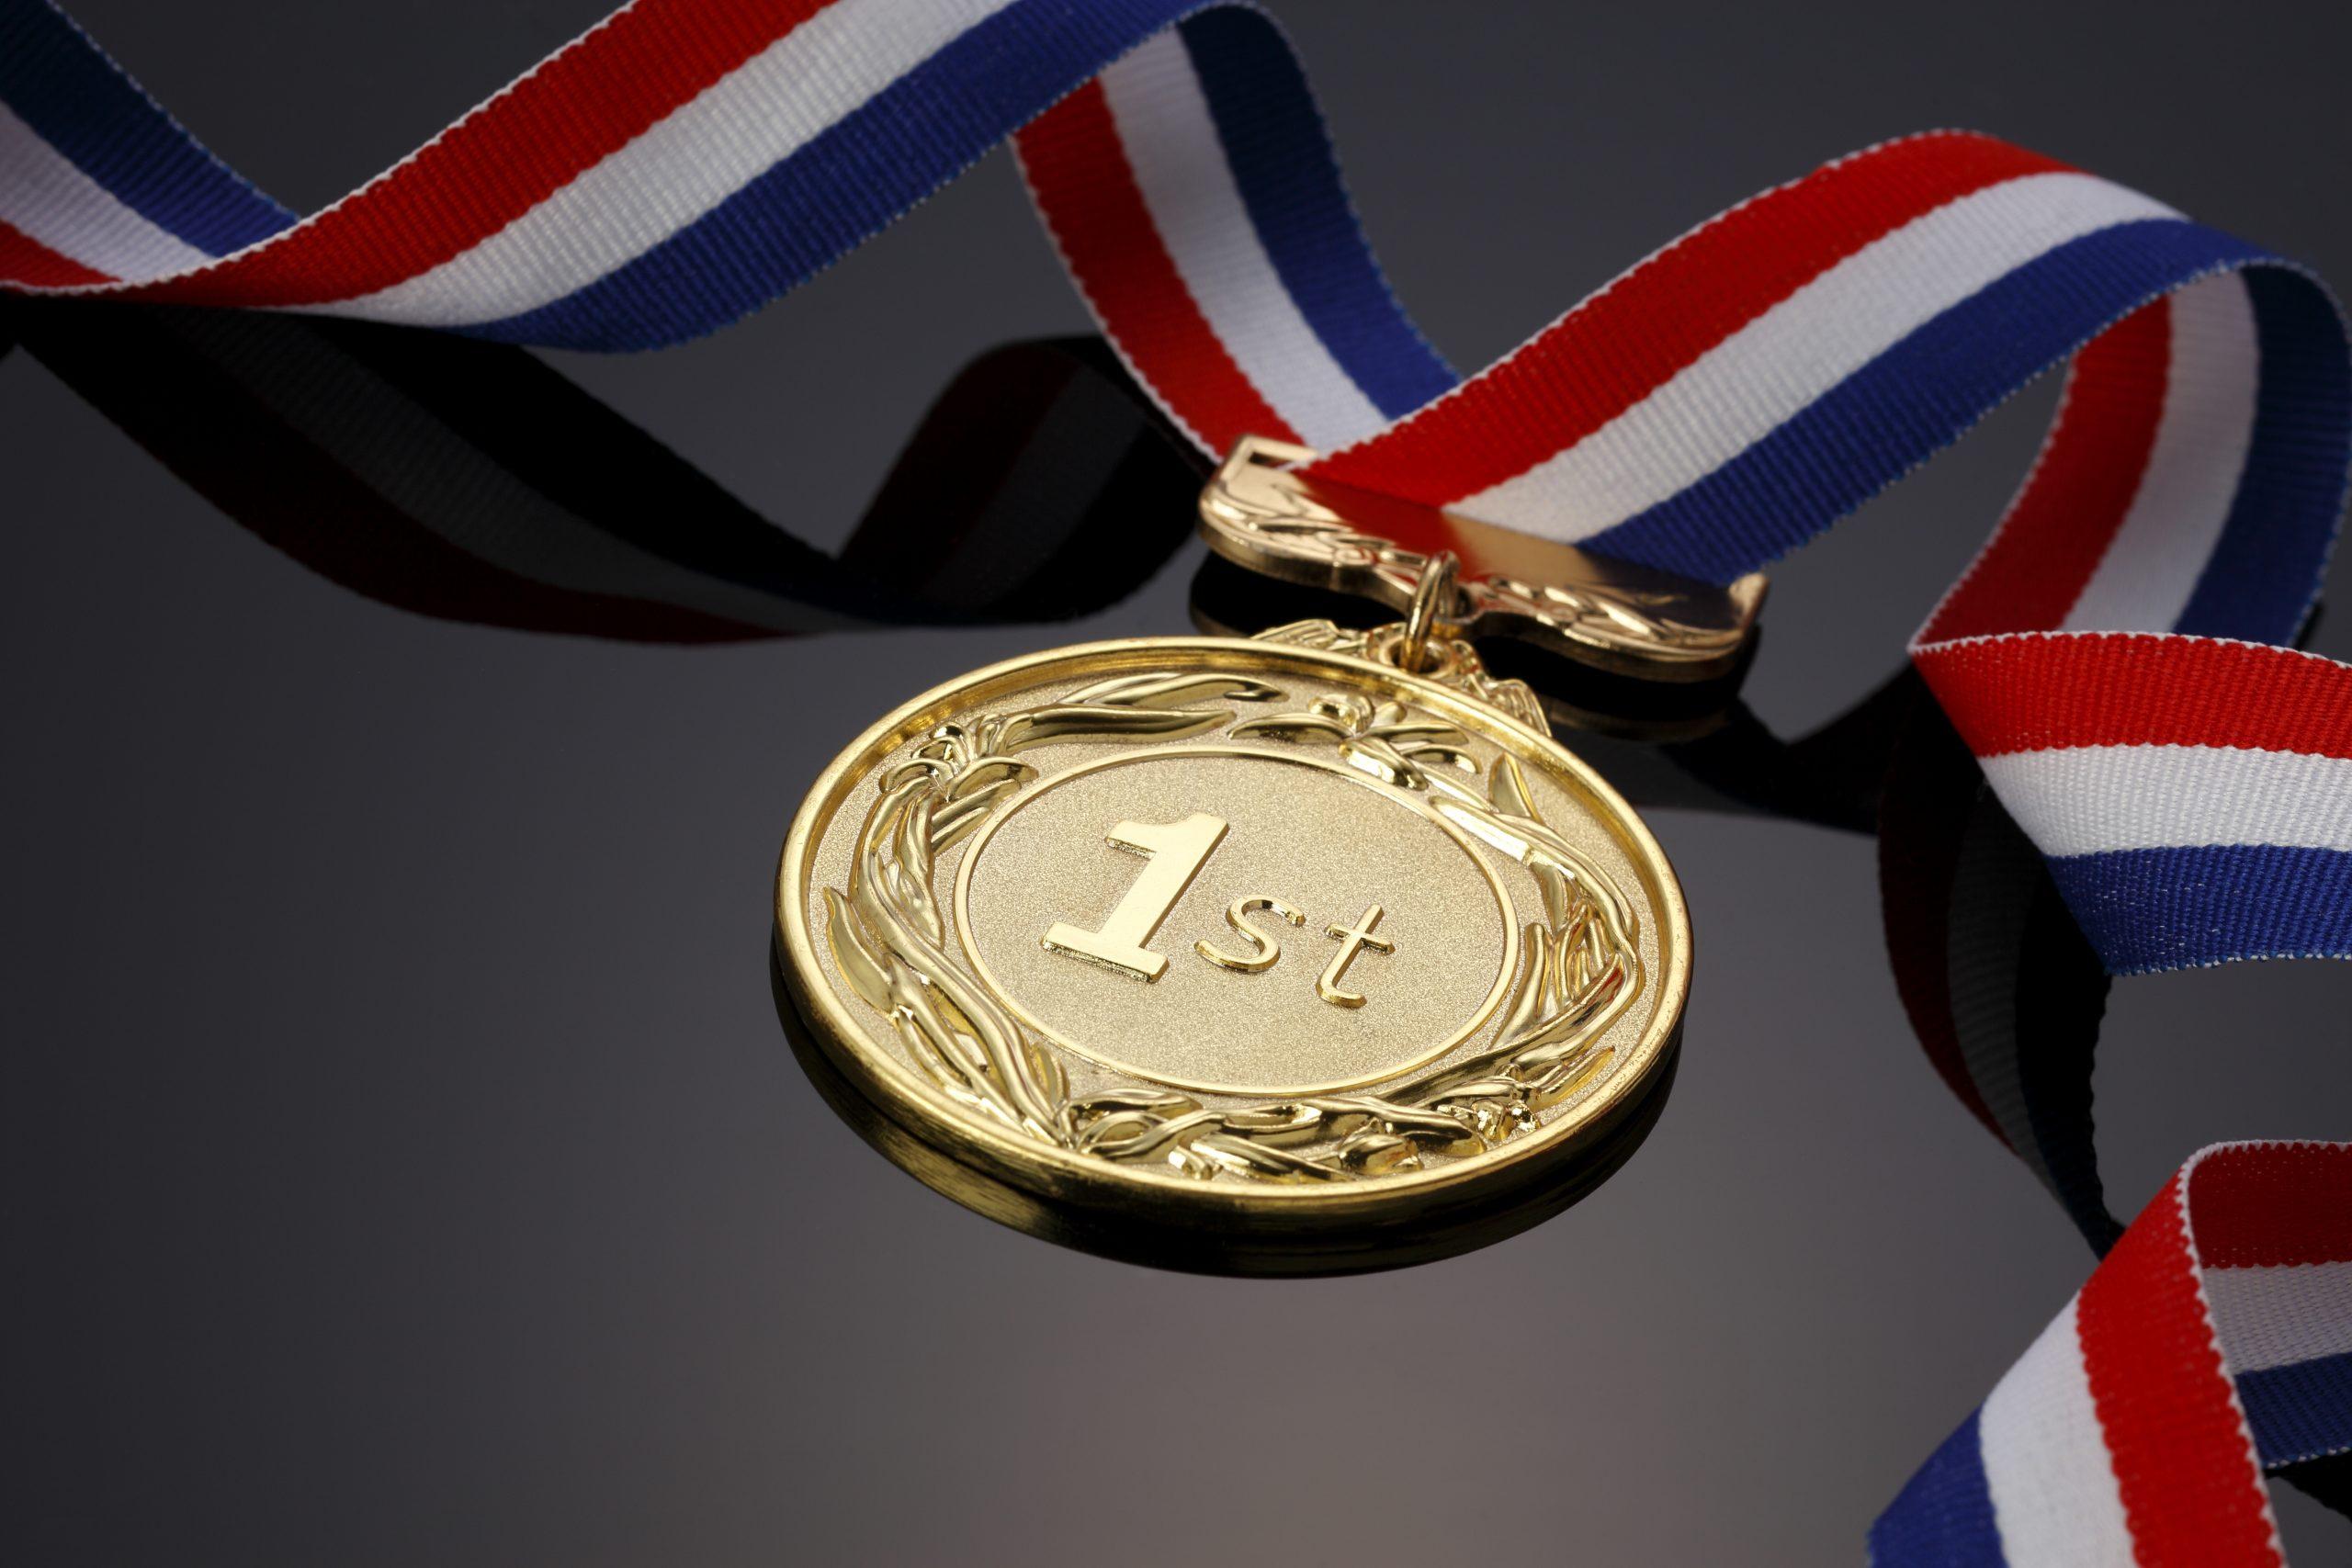 1st Gold Ribbon